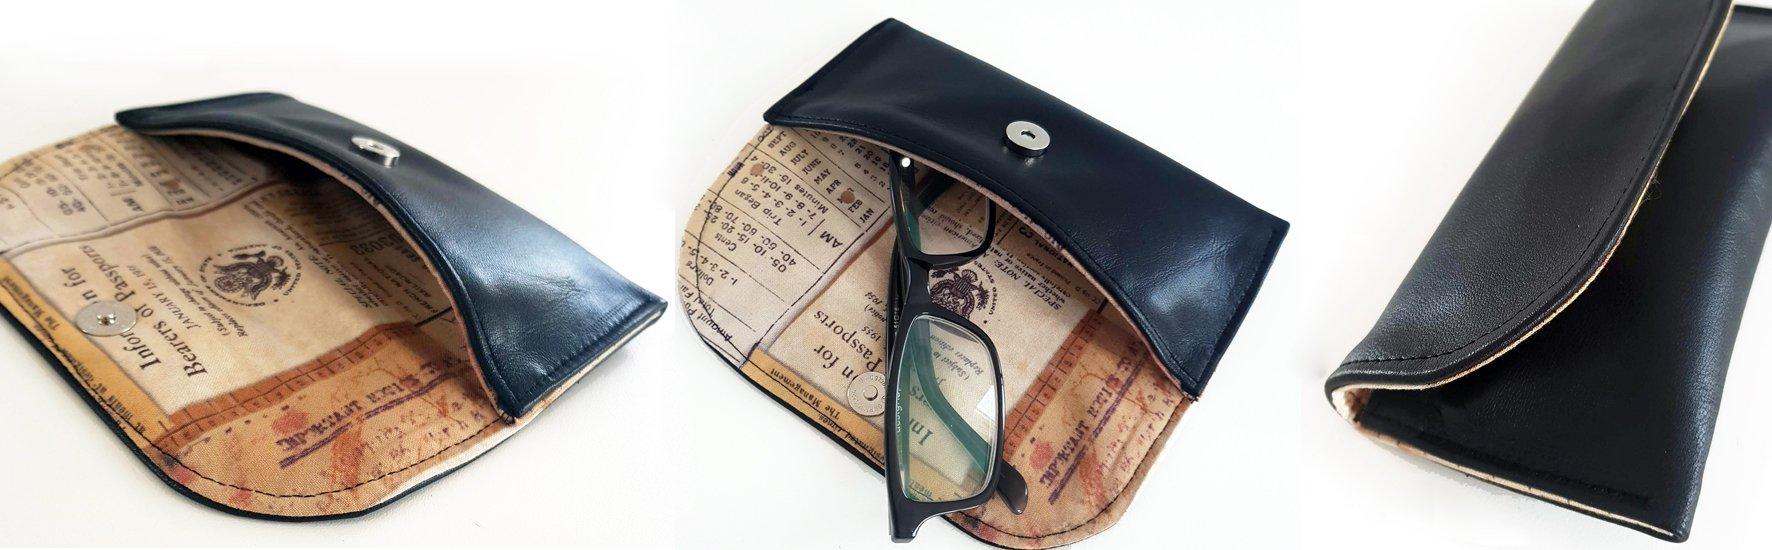 free glasses case pattern